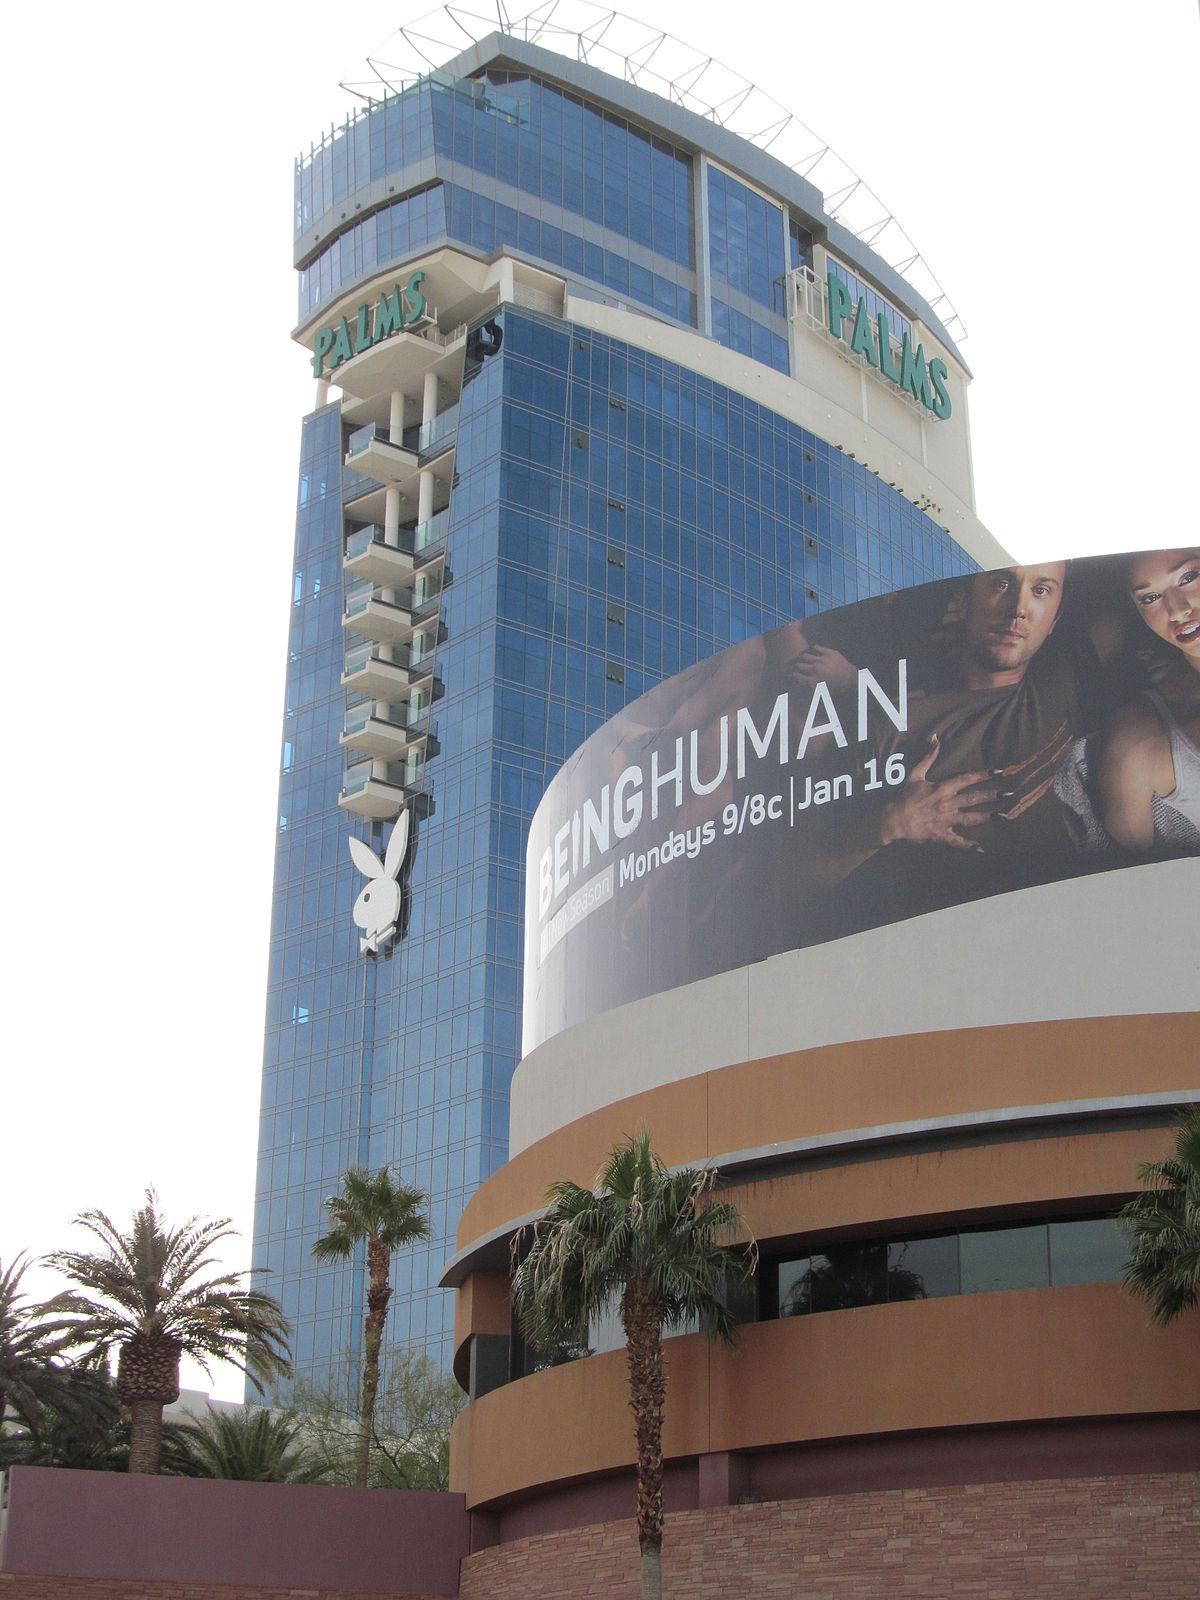 Playboy Club (Las Vegas) - Wikipedia